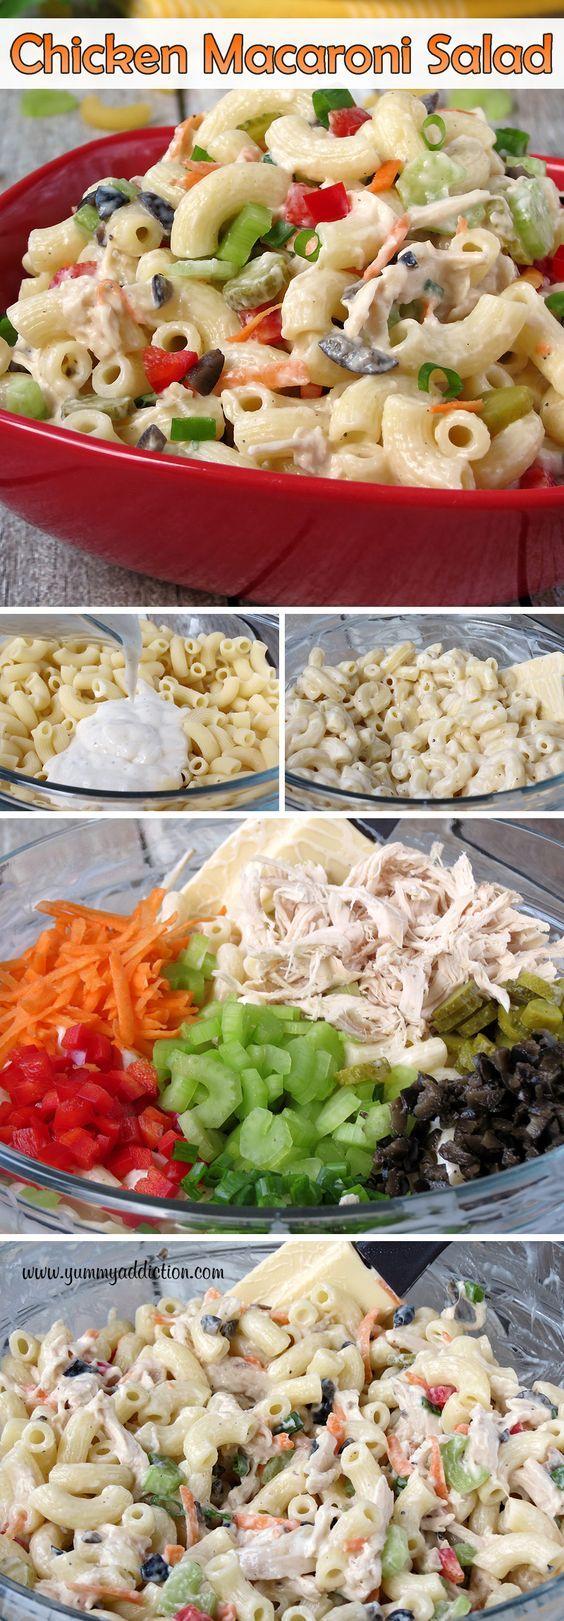 Chicken Macaroni Salad | YummyAddiction.com: